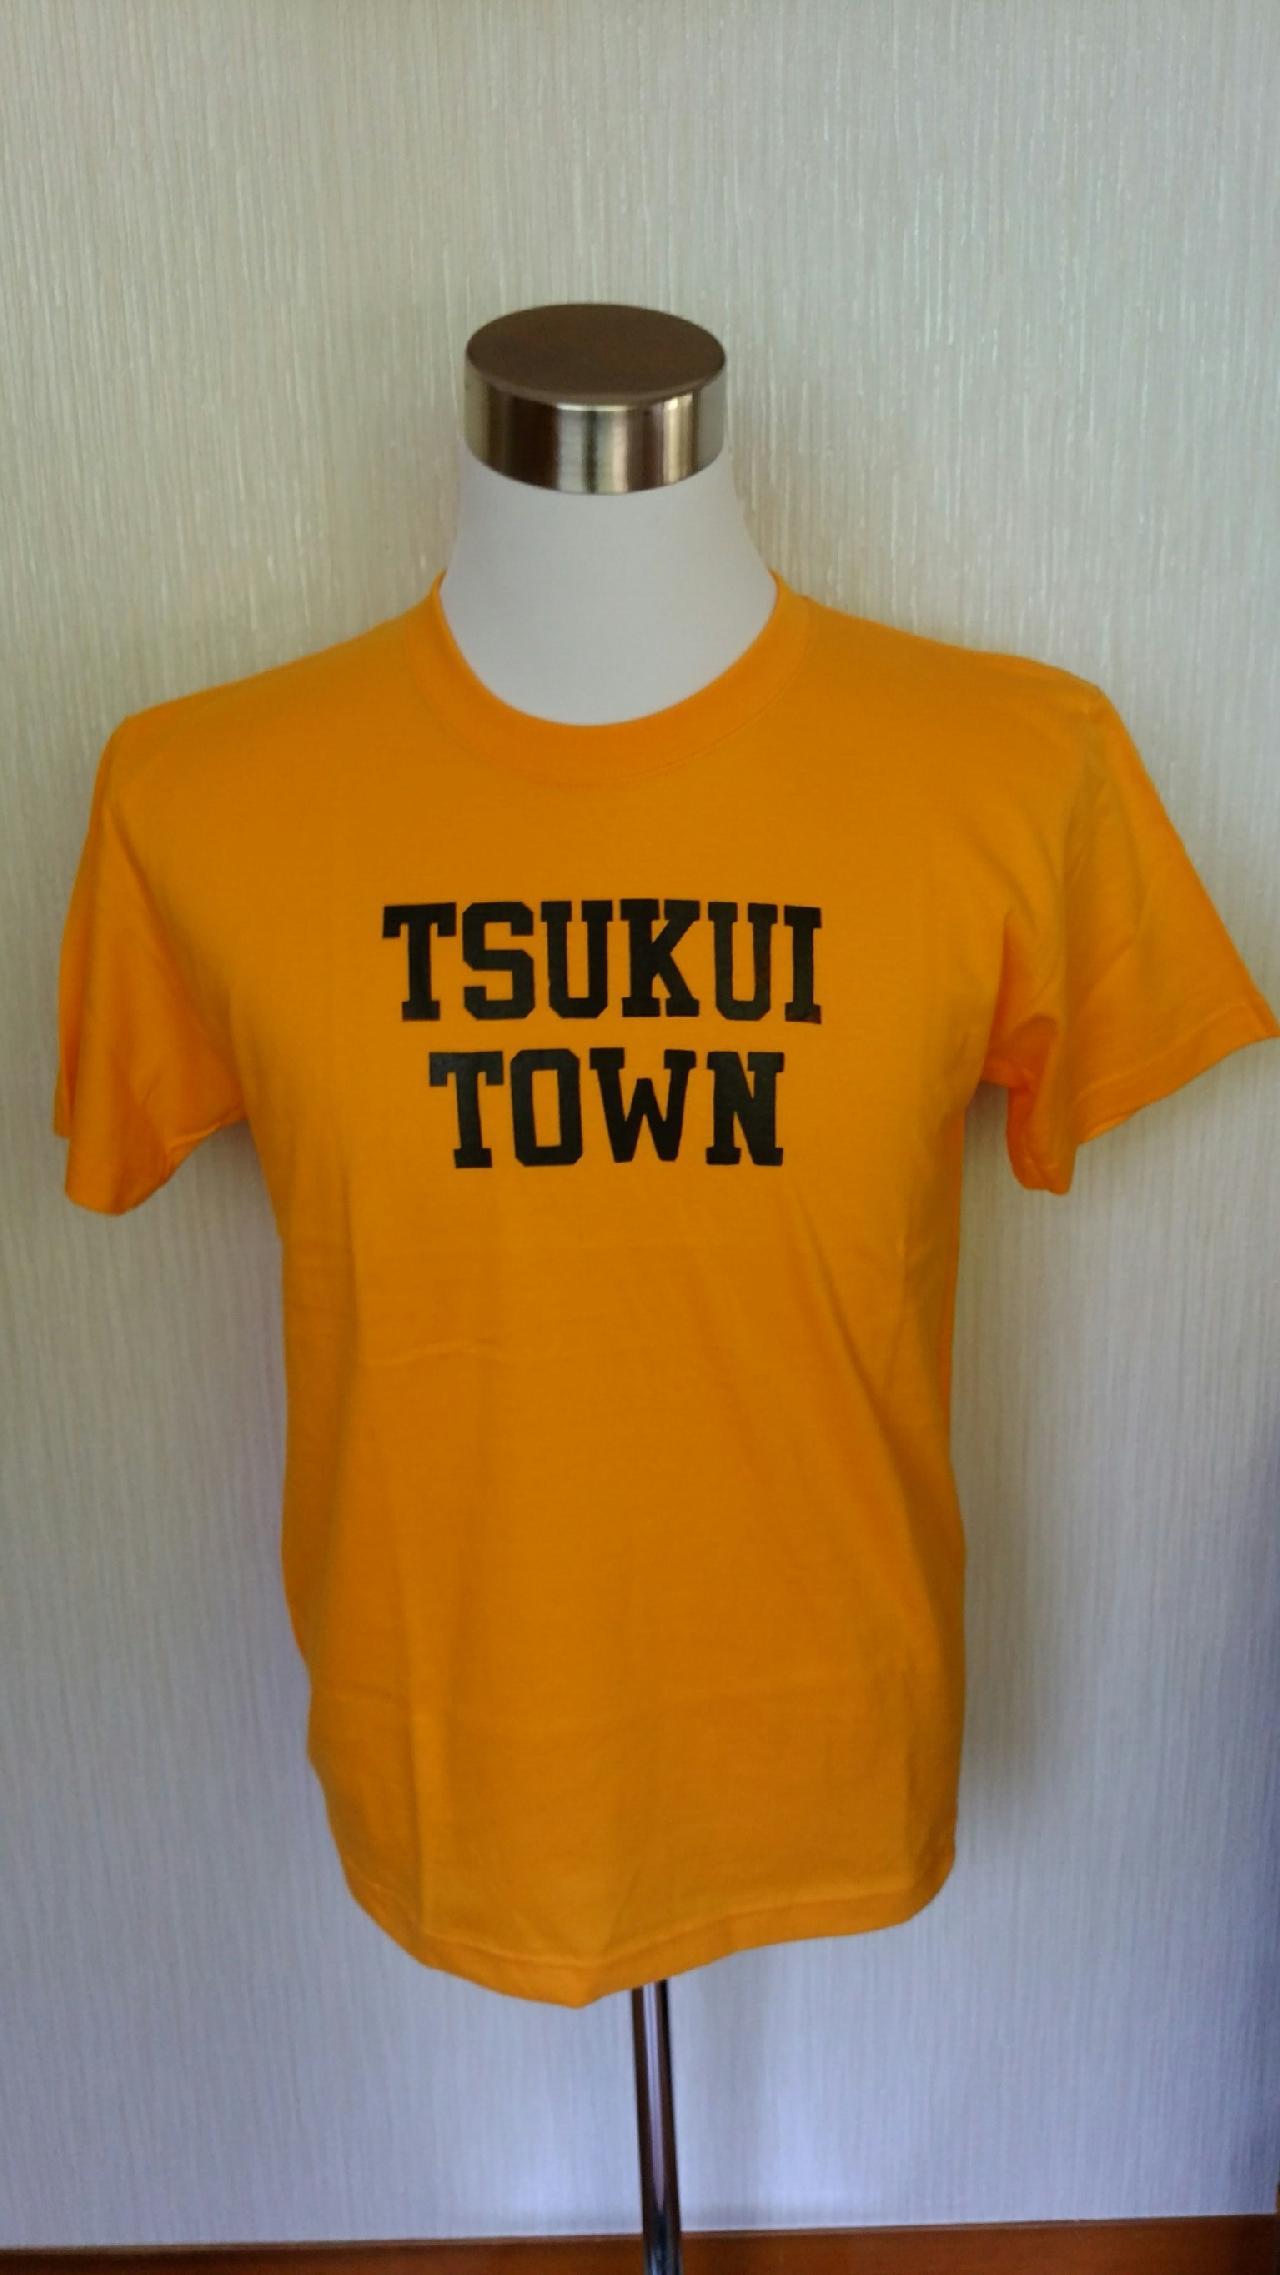 TSUKUI TOWN